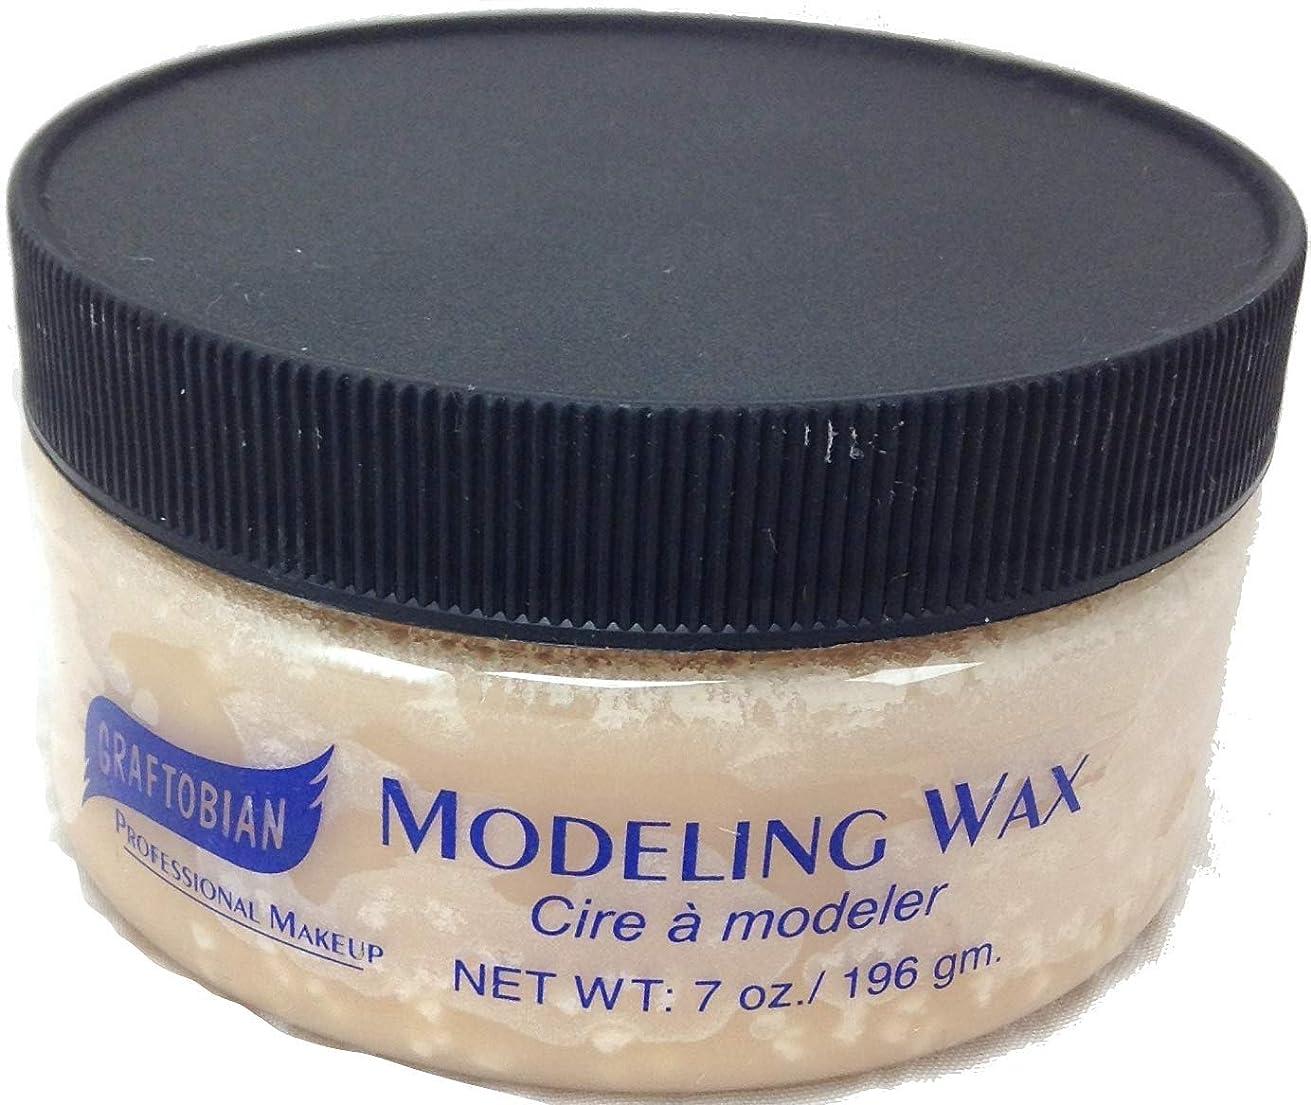 Graftobian Modeling Wax Flesh Color (7 oz)